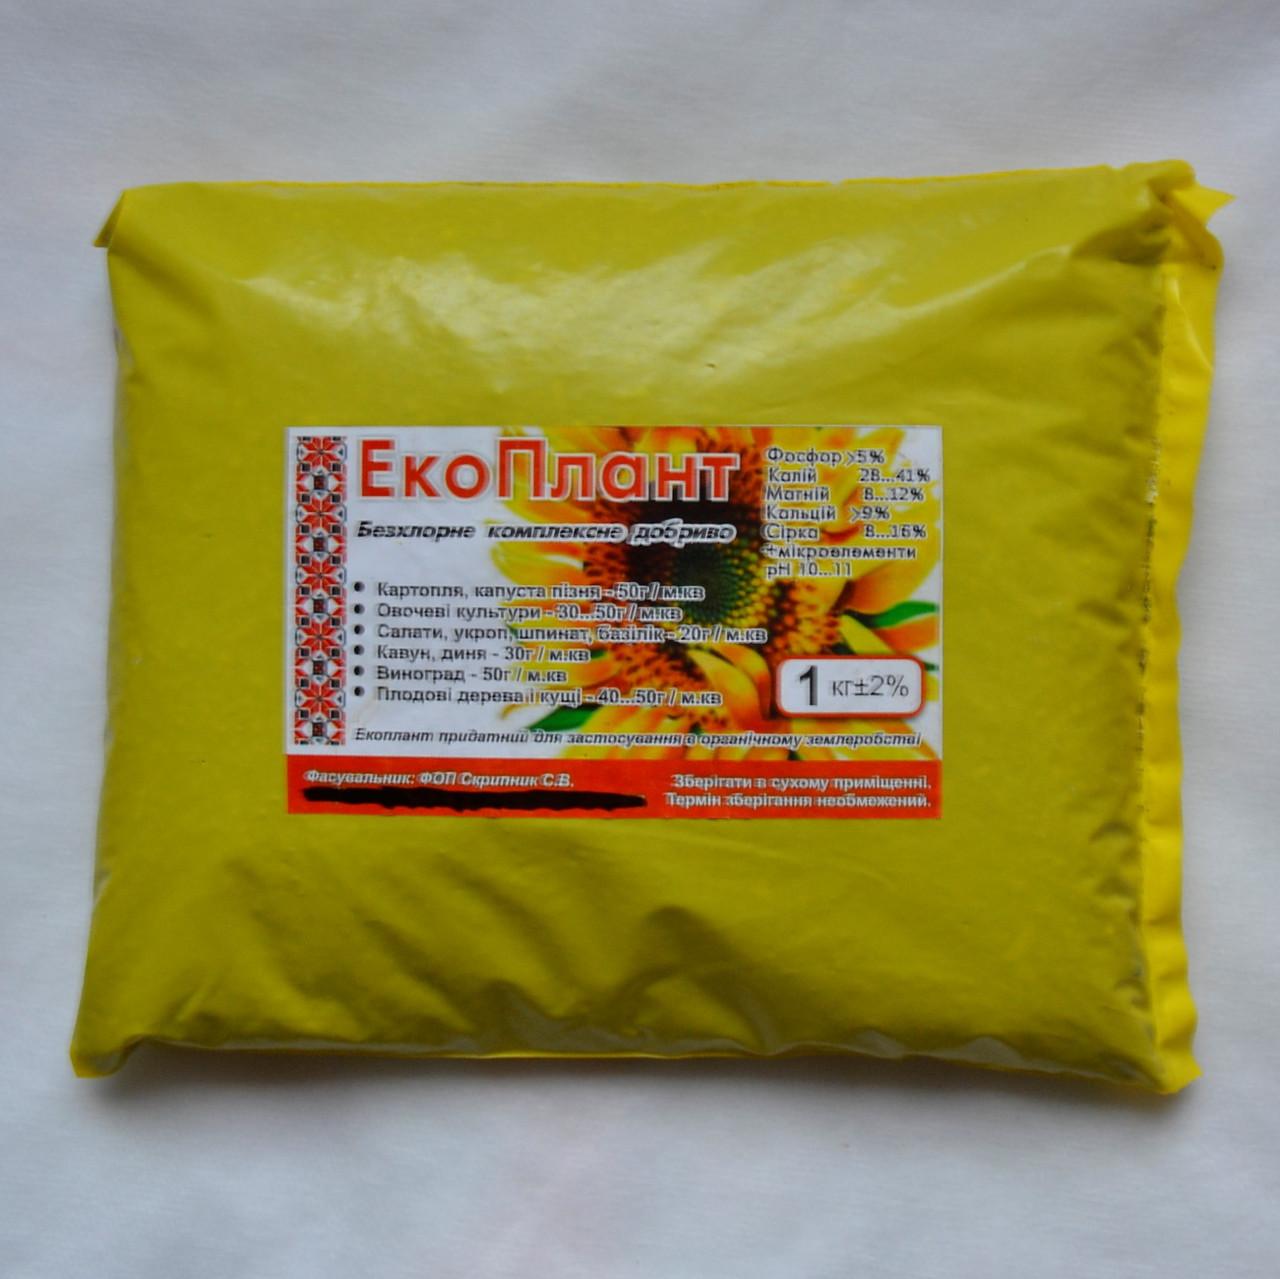 Удобрение ЕкоПлант, 1 кг - P5%, K28%, Mg7%, Ca14%, S25% - (68241088)